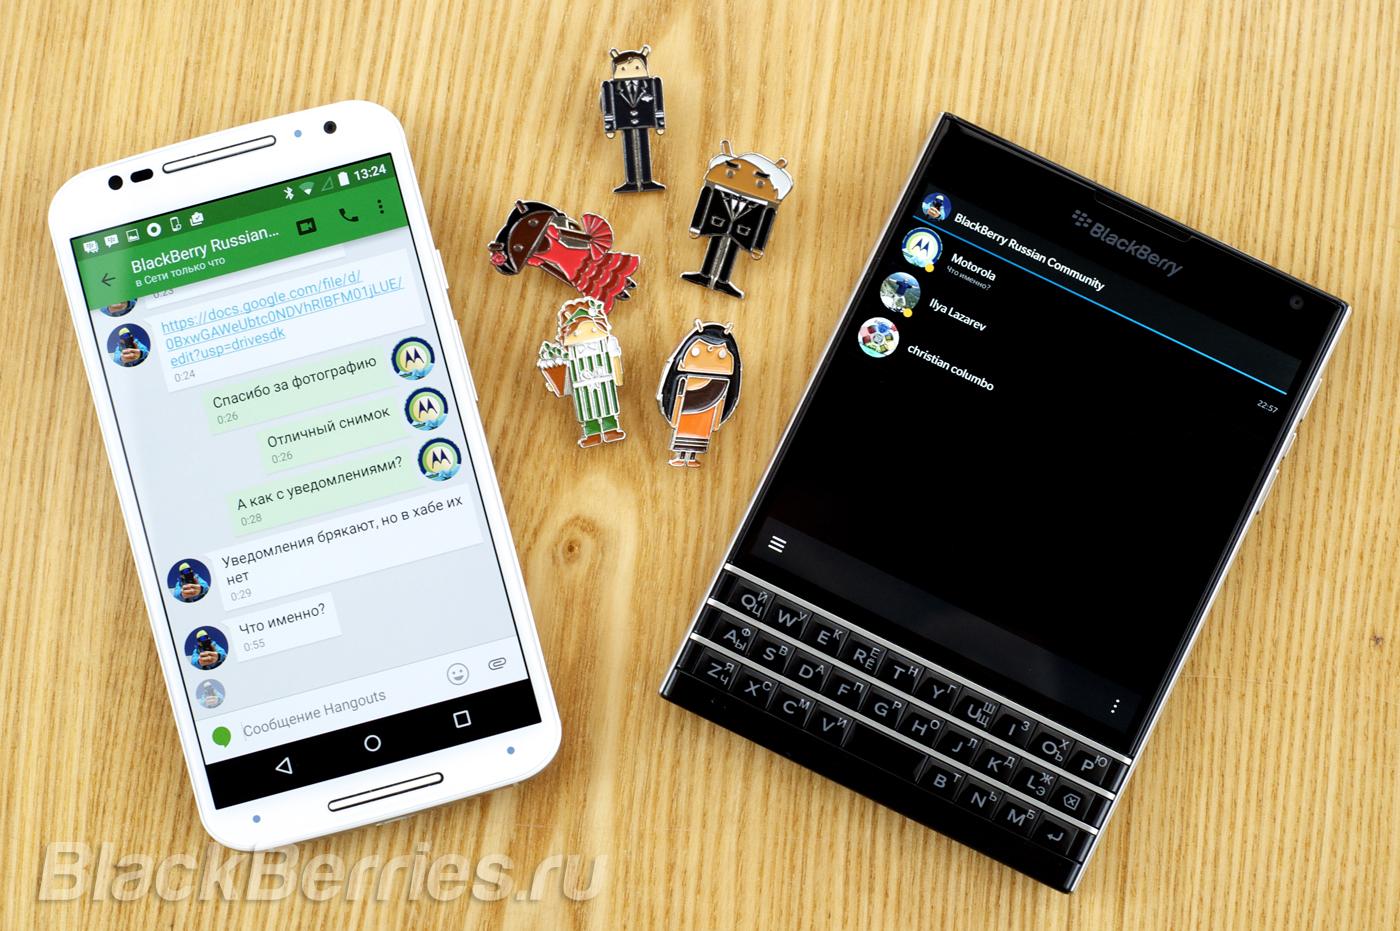 BlackBerry-Motorola-Hg10-2